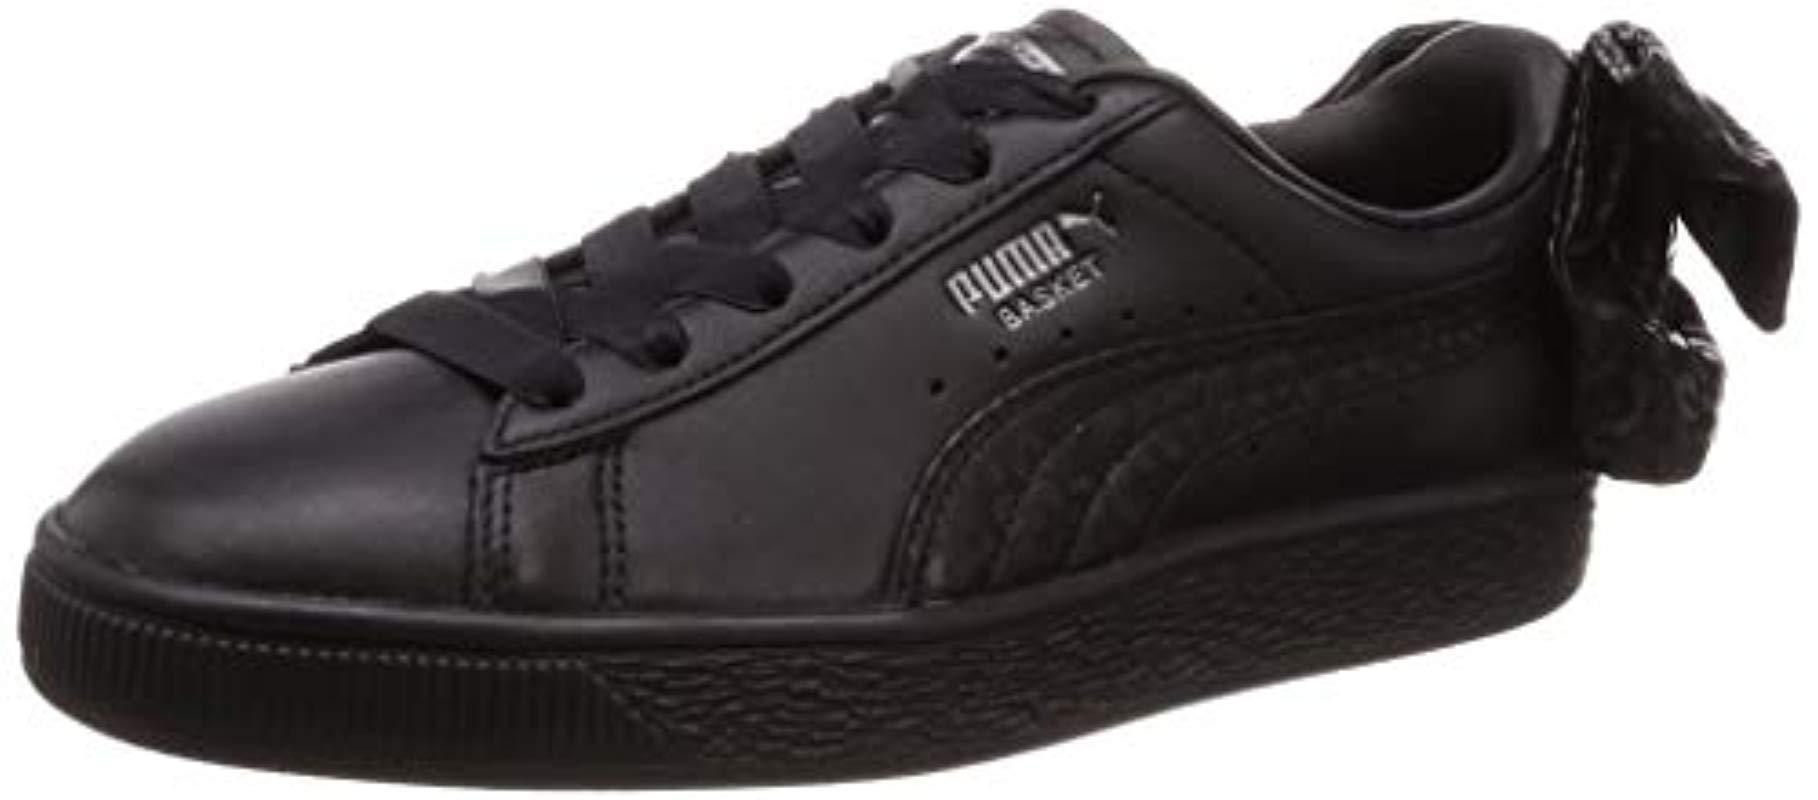 PUMA Leather Basket Bow Trainers Black